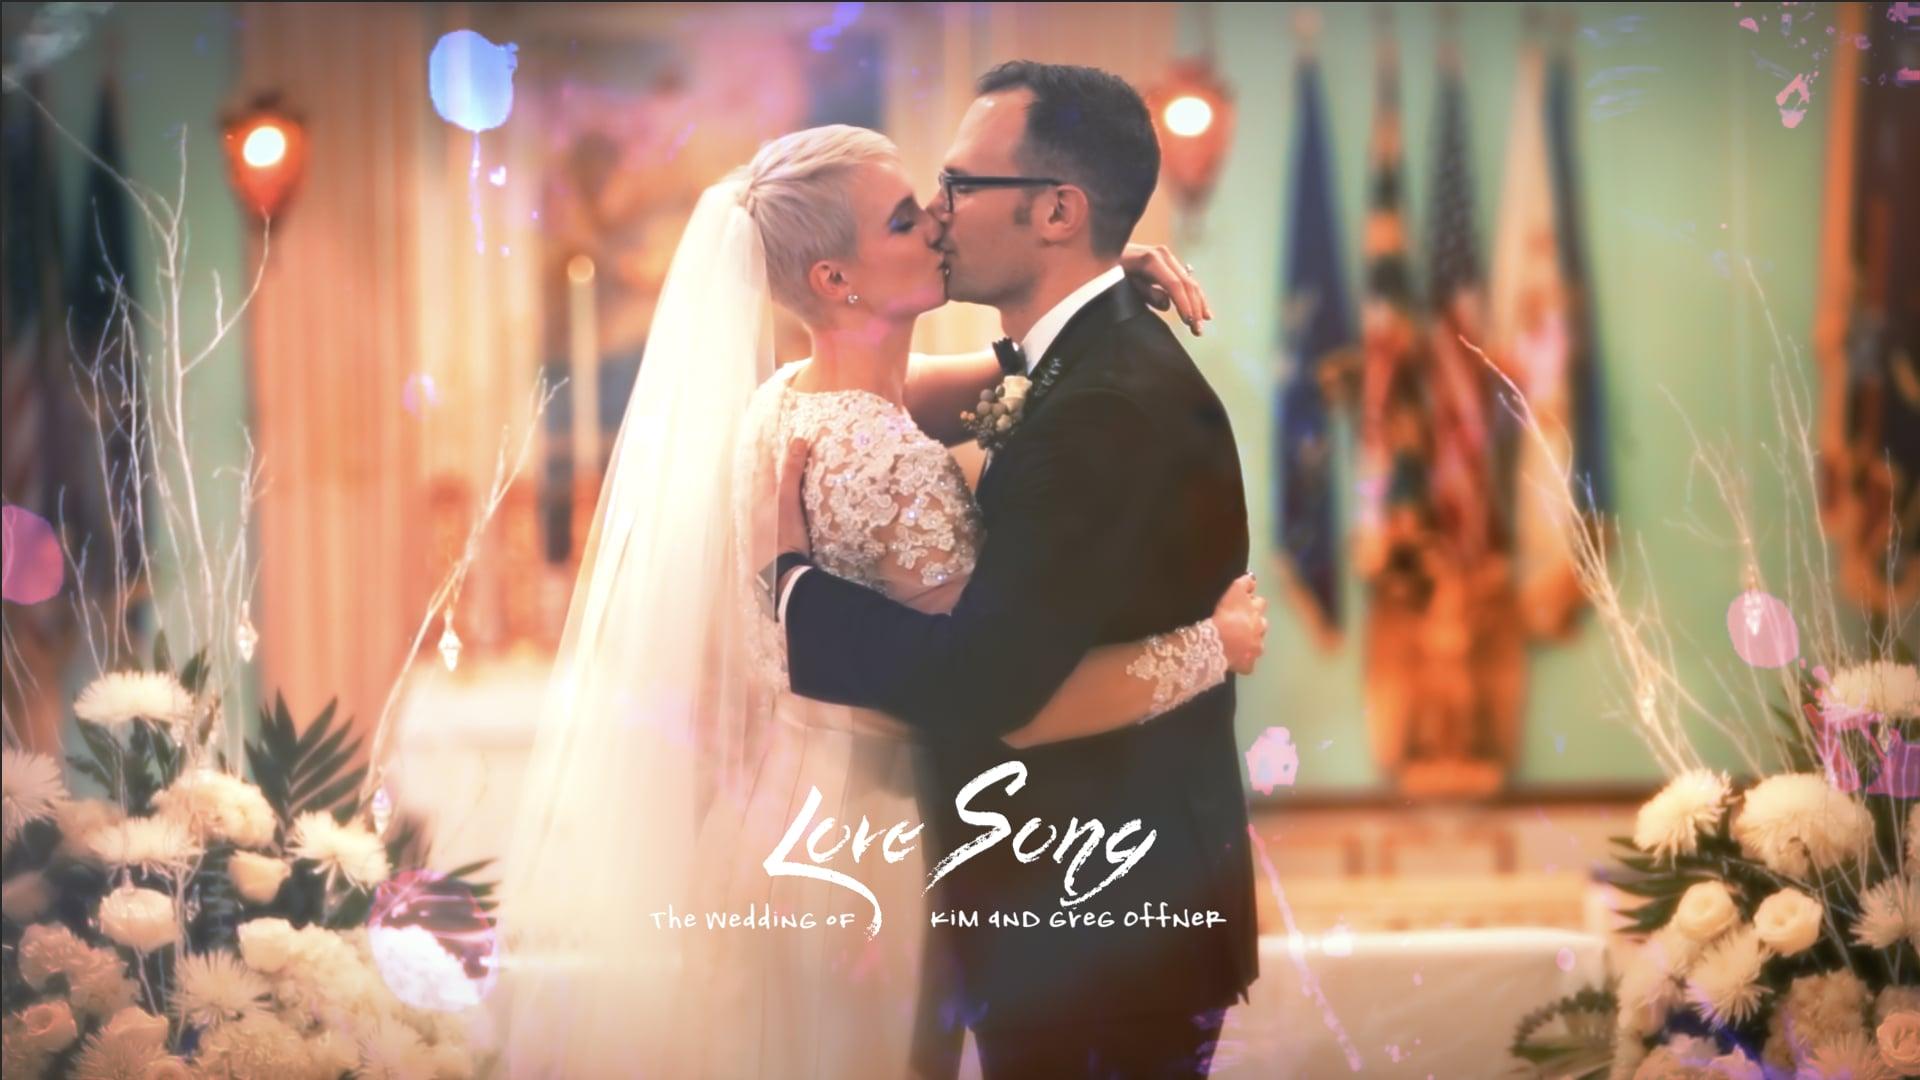 Lovesong: The Wedding of Kim Graf and Greg Offner